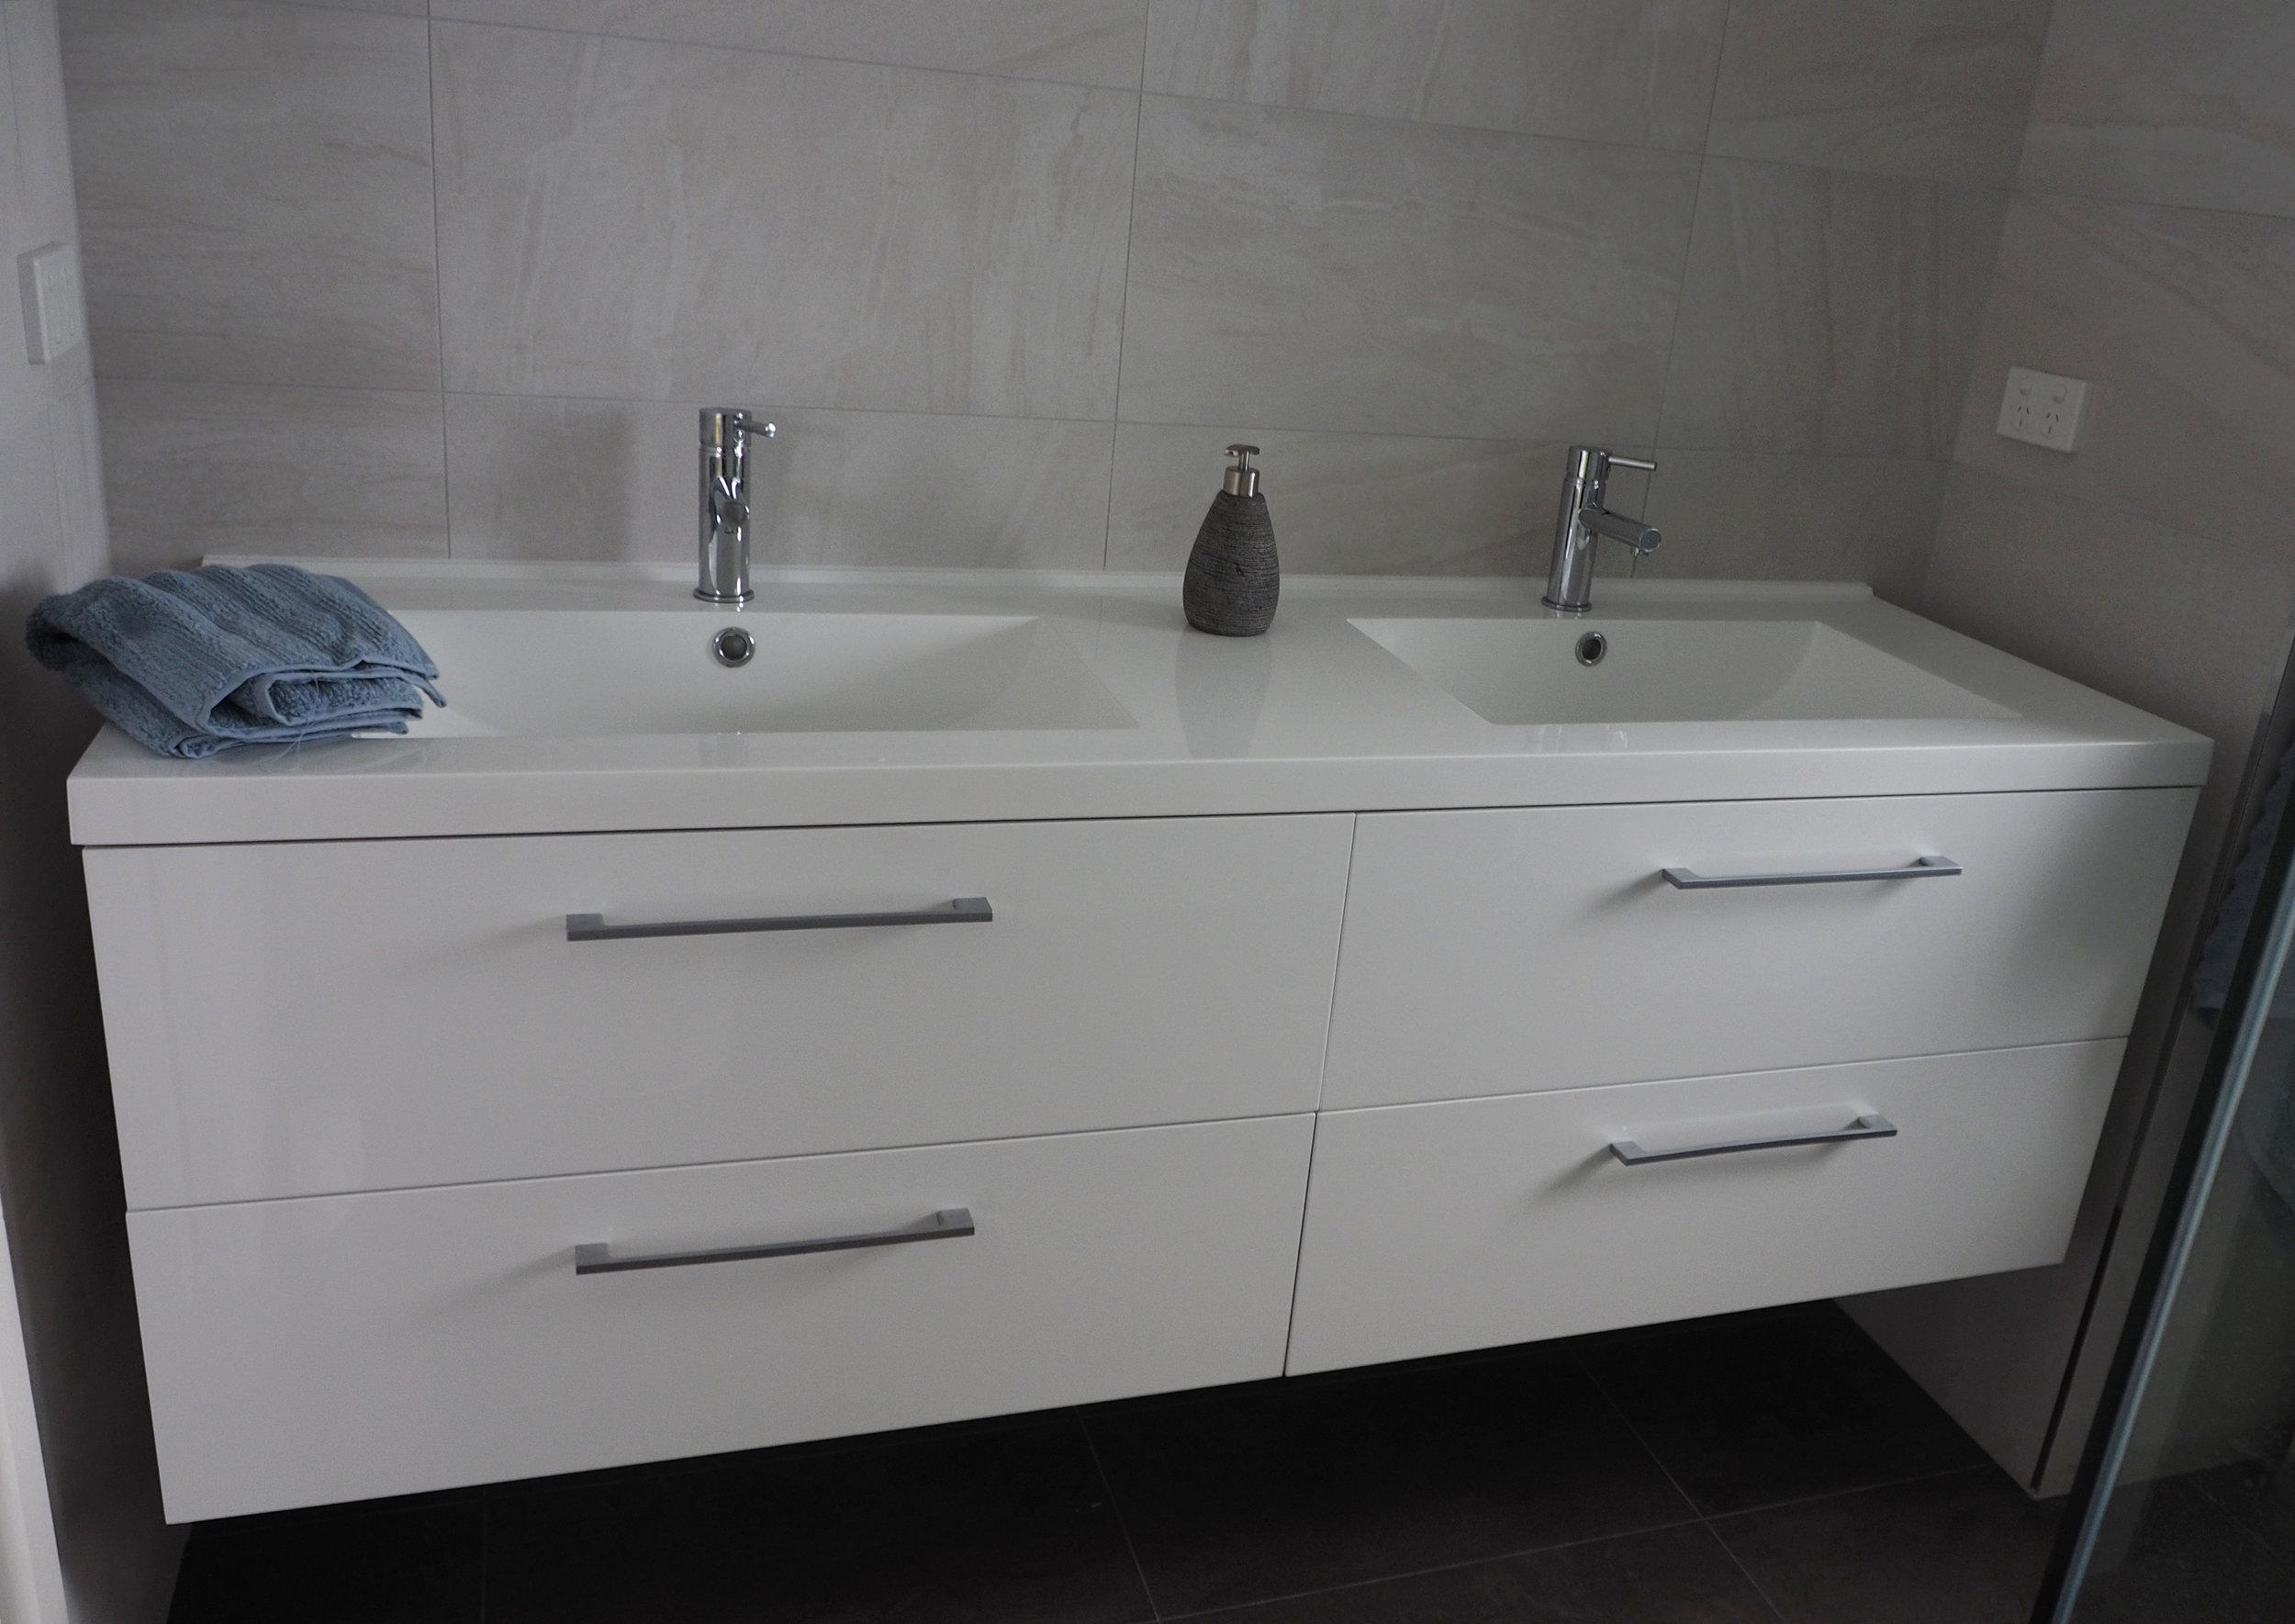 Bathroom design and decor ideas - The Organised You